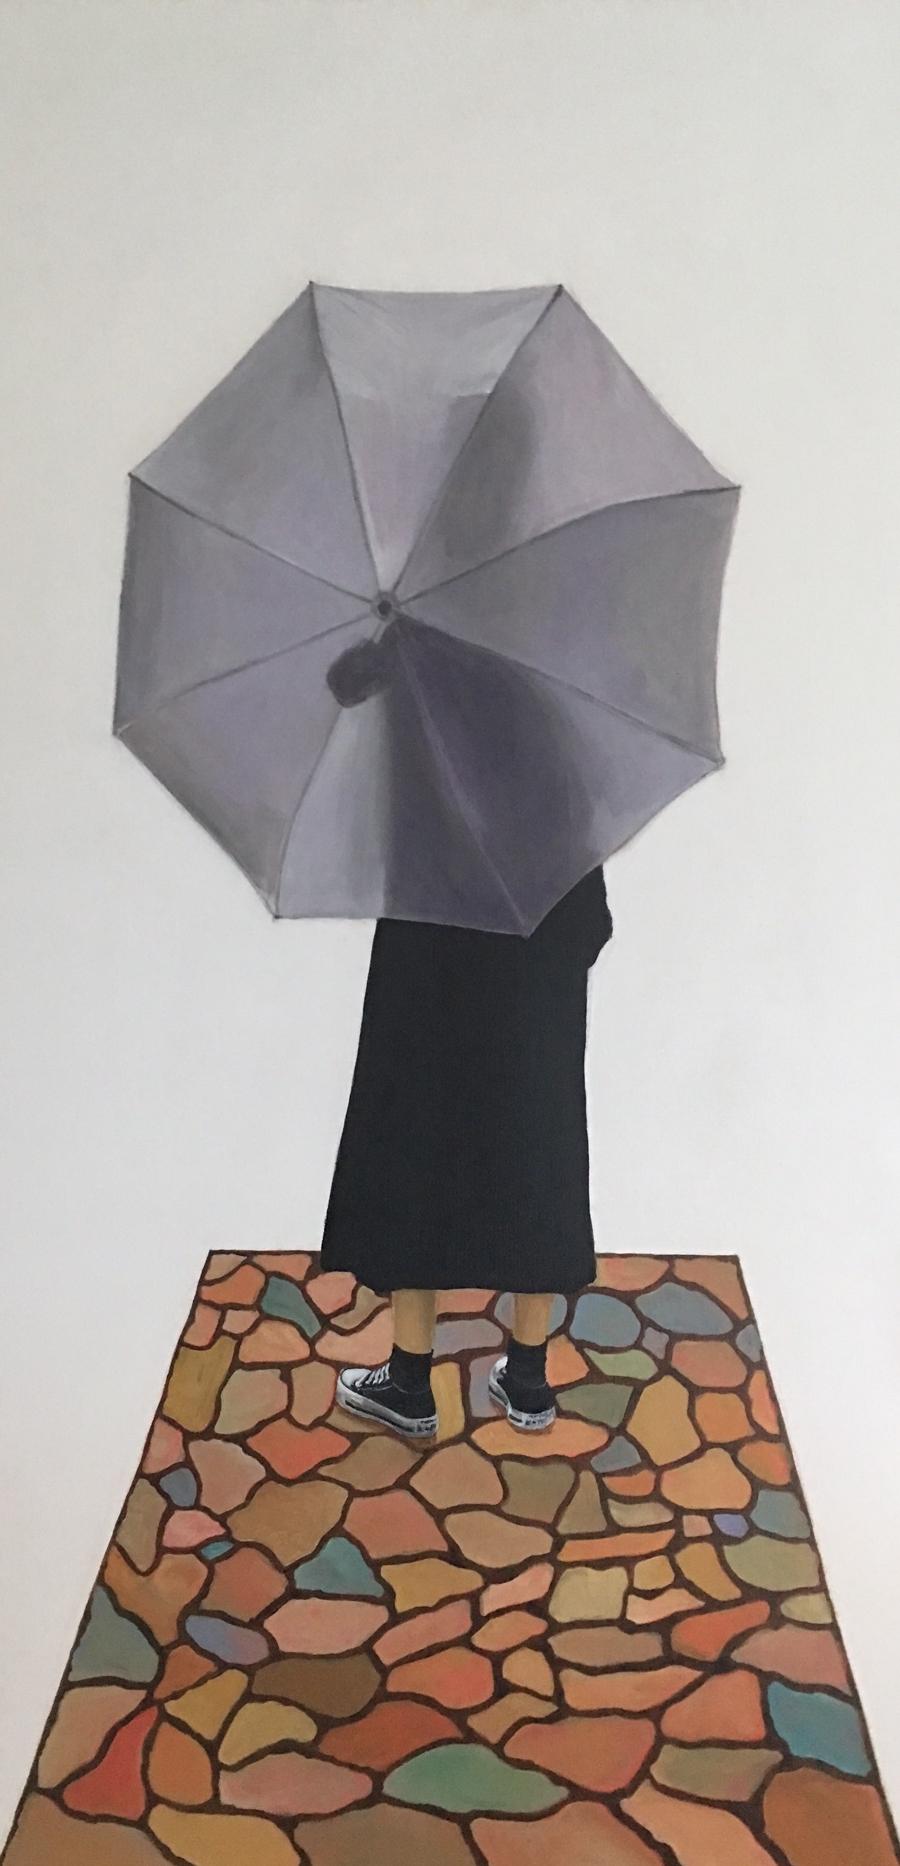 "Longings (Añoranzas)   Monica Perez-Roulet  Acrylic on Canvas  24"" x 48""  NFS"